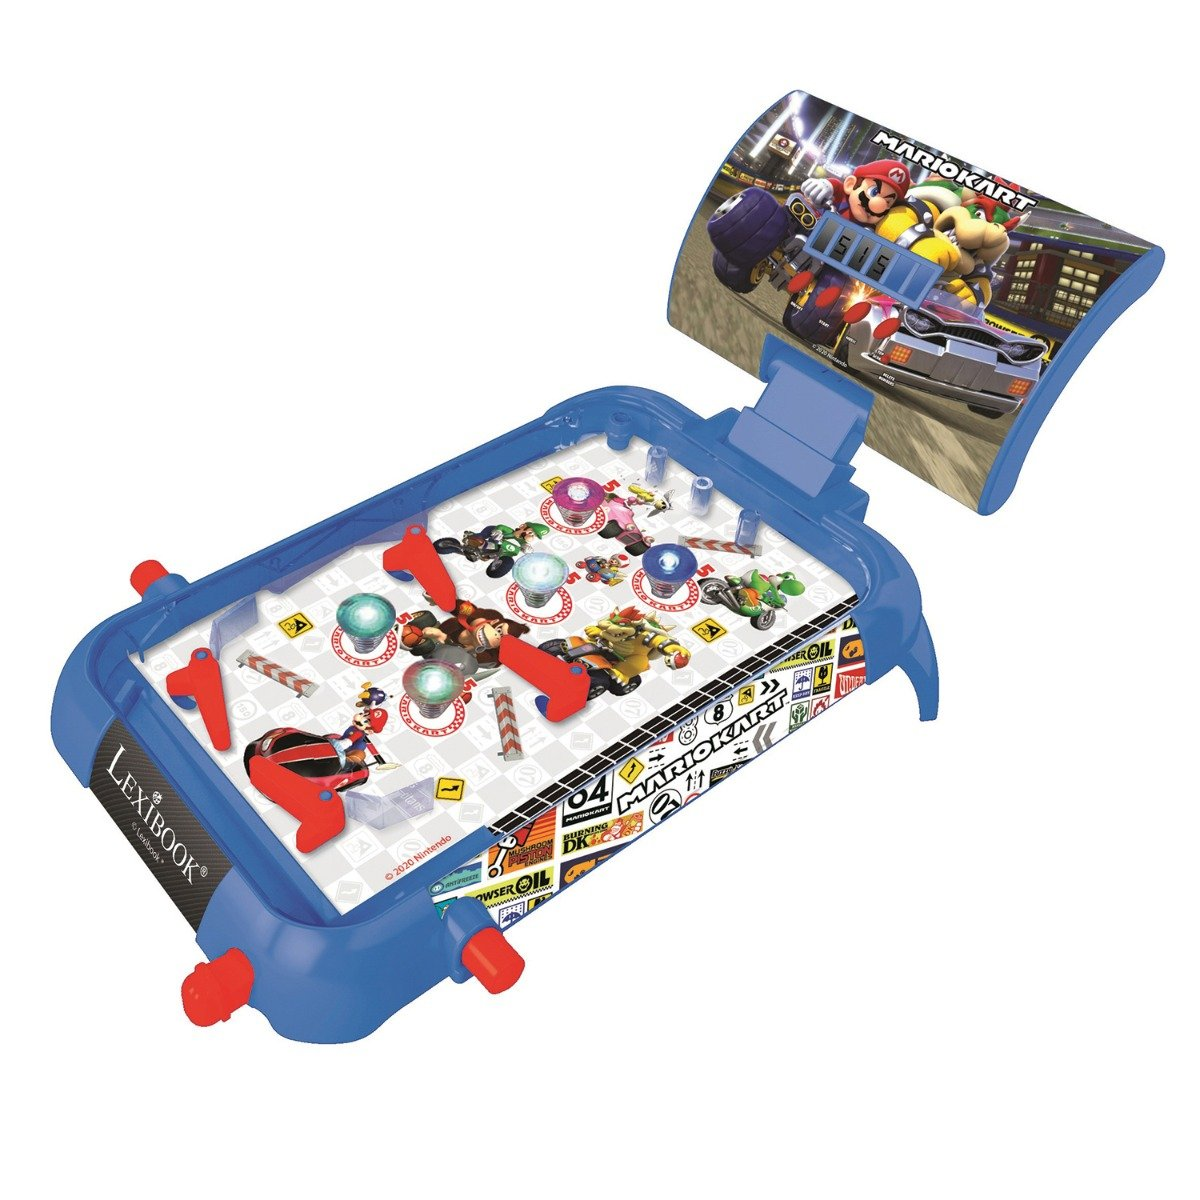 Jucarie interactiva Lexibook, Electronic pinball cu lumini si sunete, Mario Kart